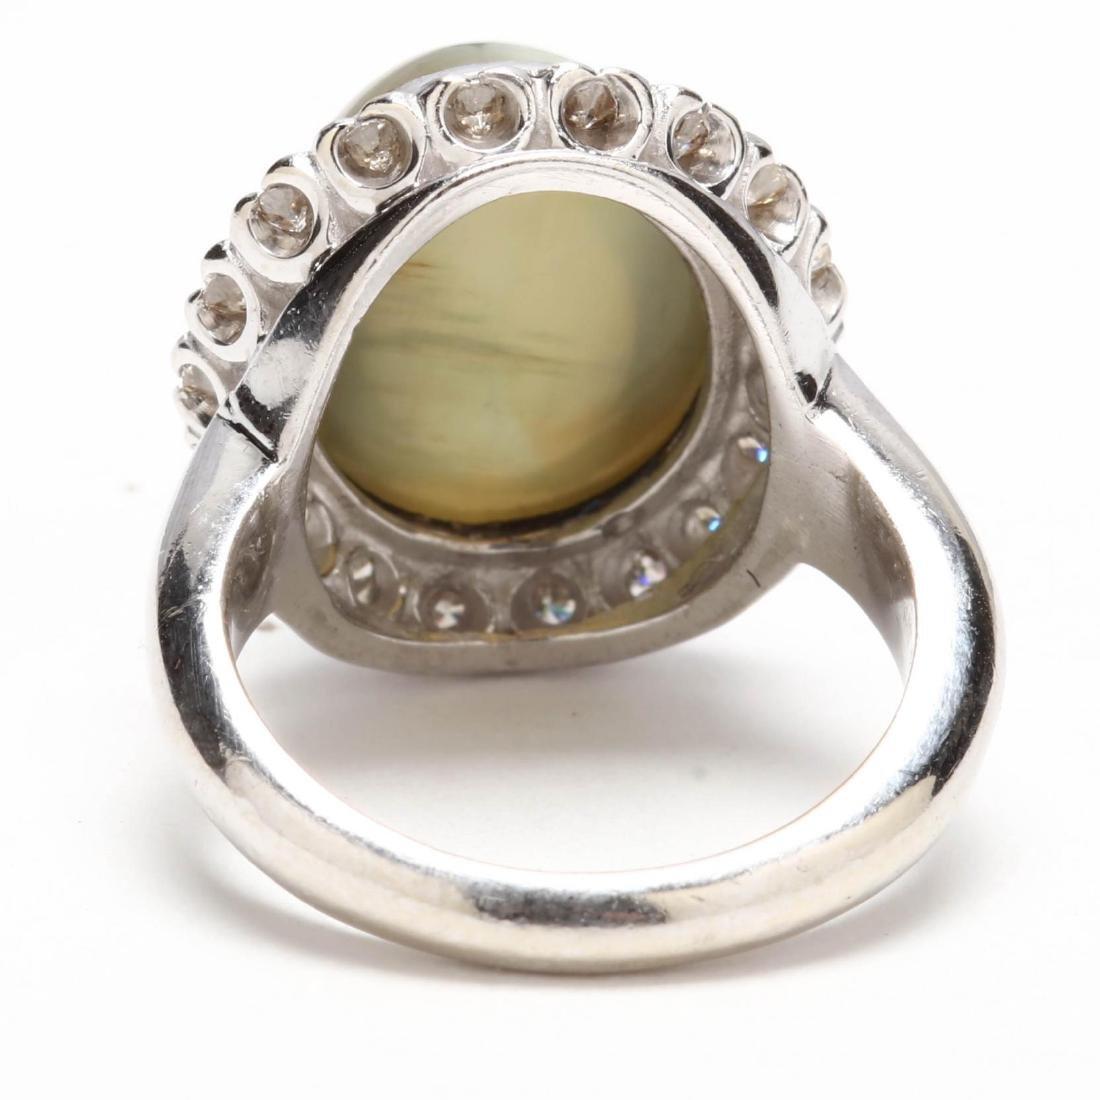 14KT White Gold, Cat's Eye Chrysoberyl, and Diamond - 4